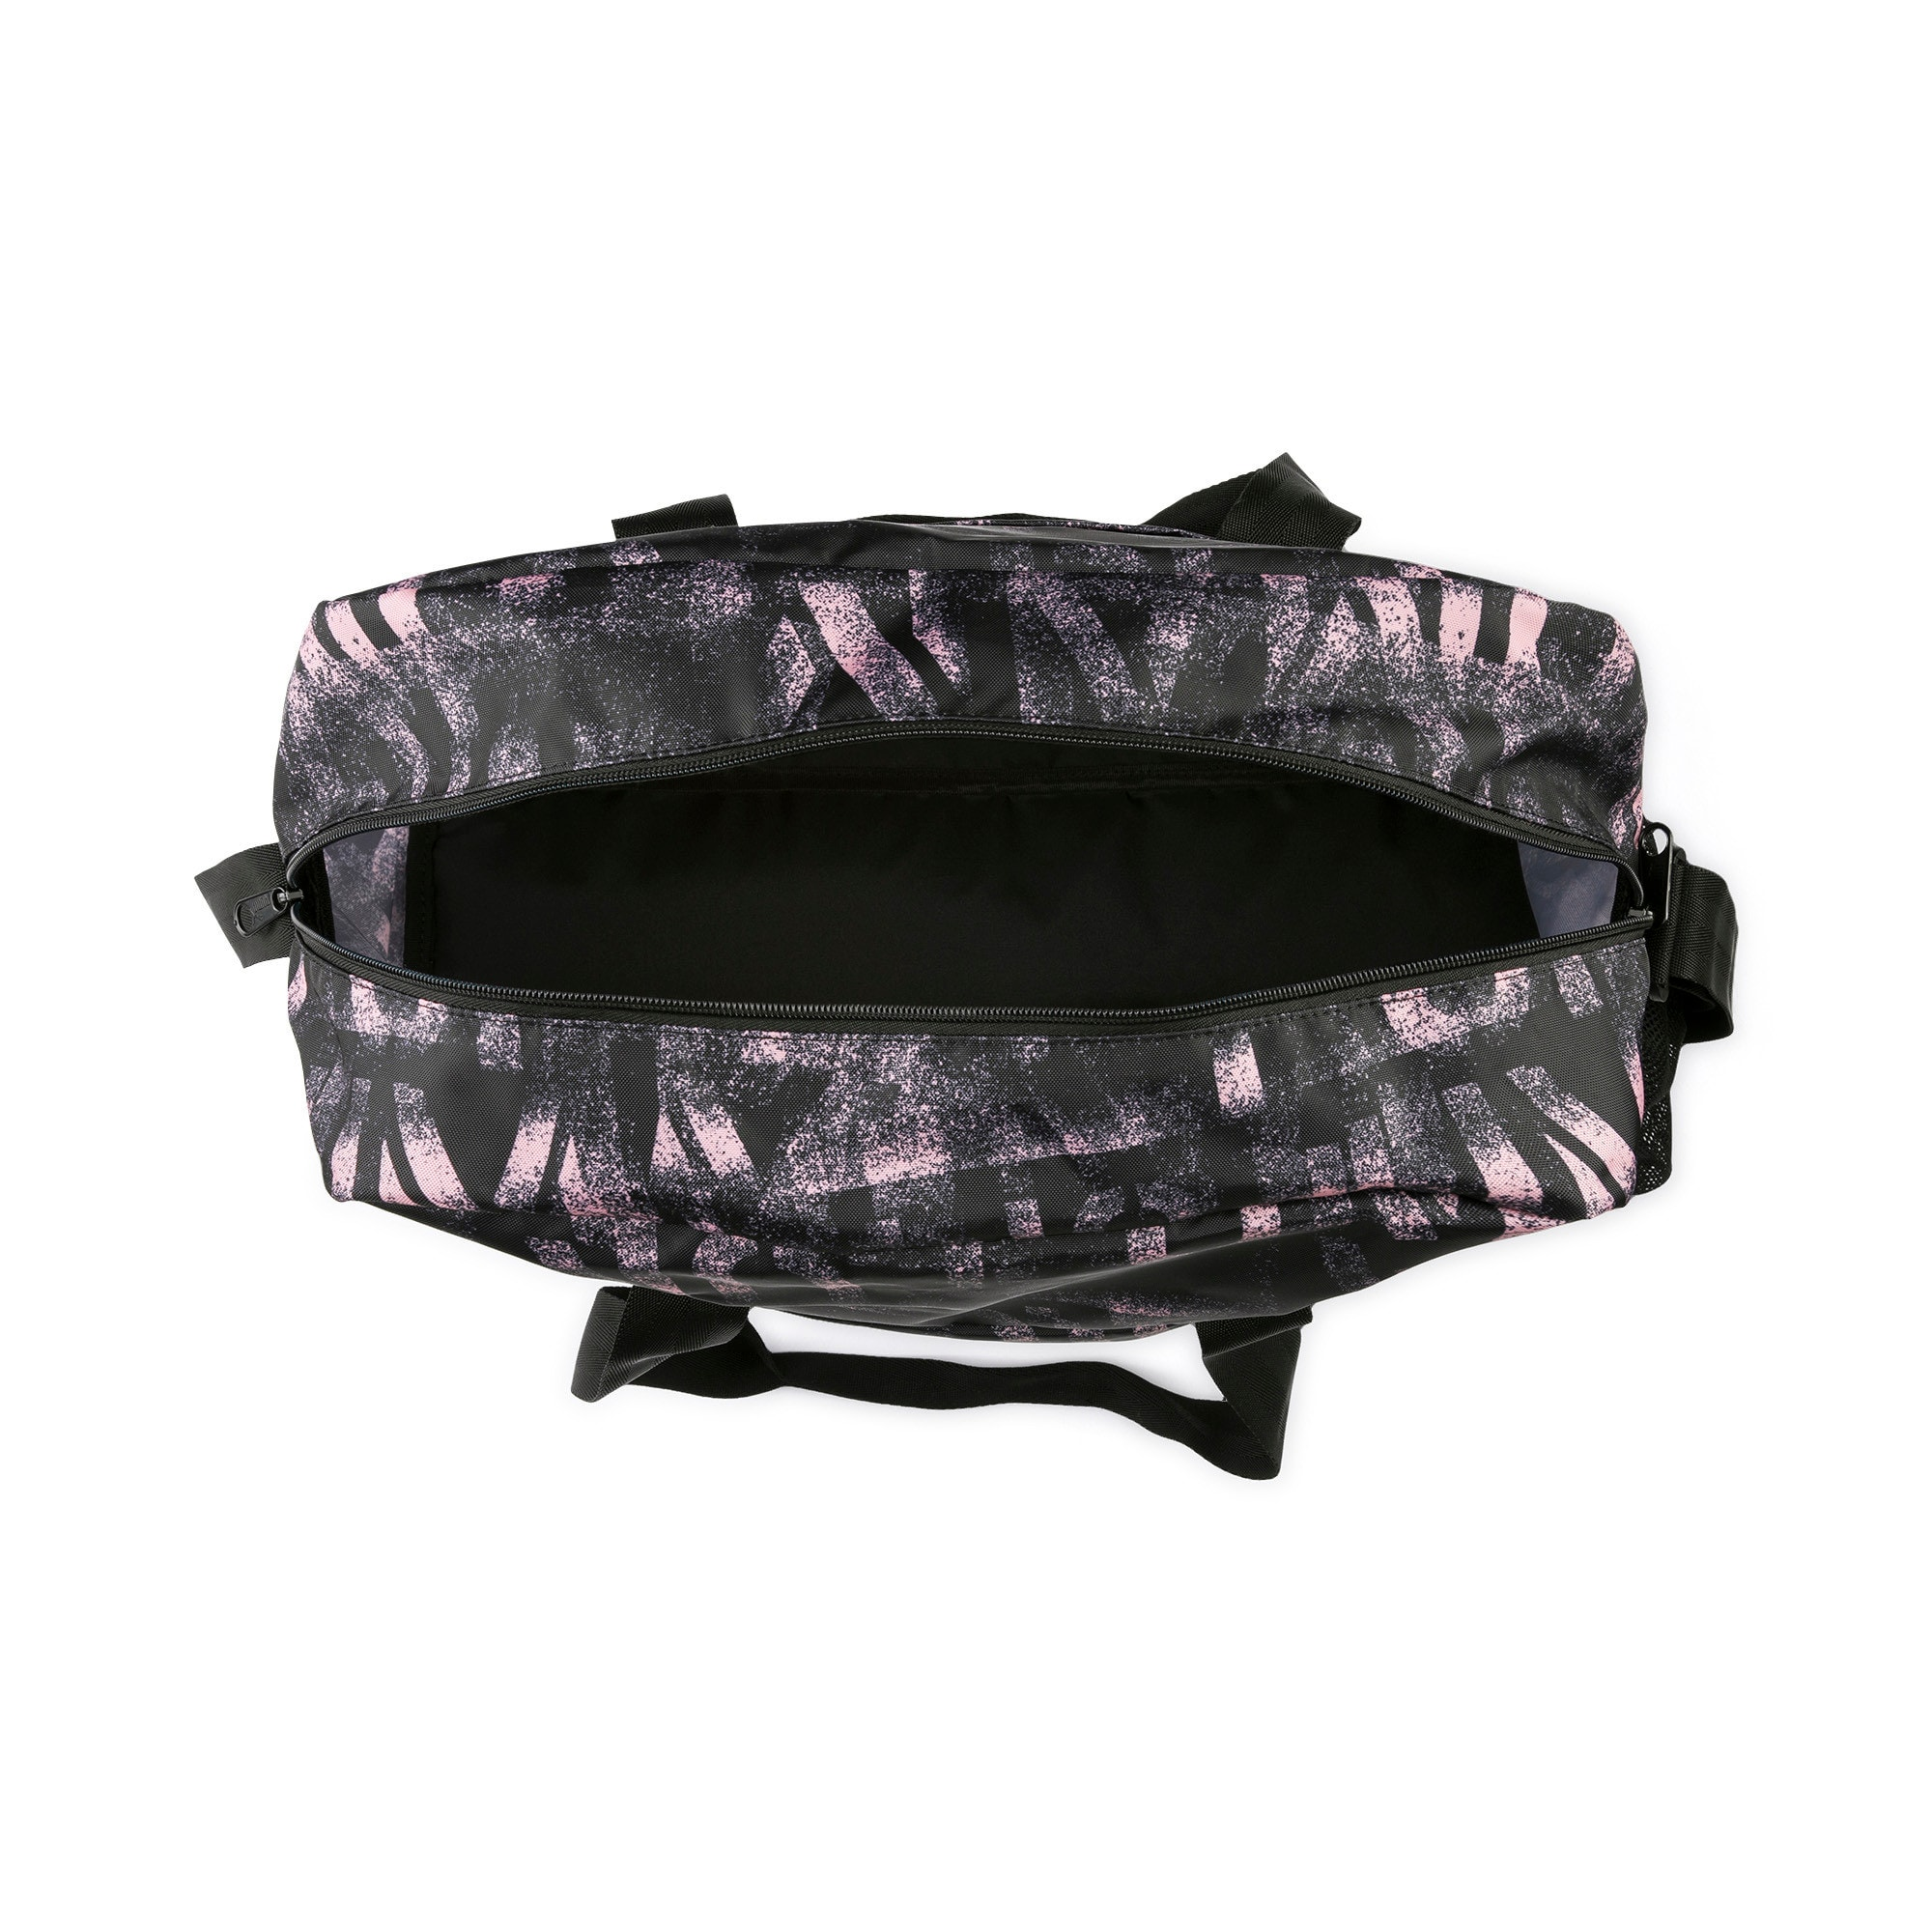 Thumbnail 4 of AT ESS Grip Bag, Puma Black-Bridal Rose-AOP, medium